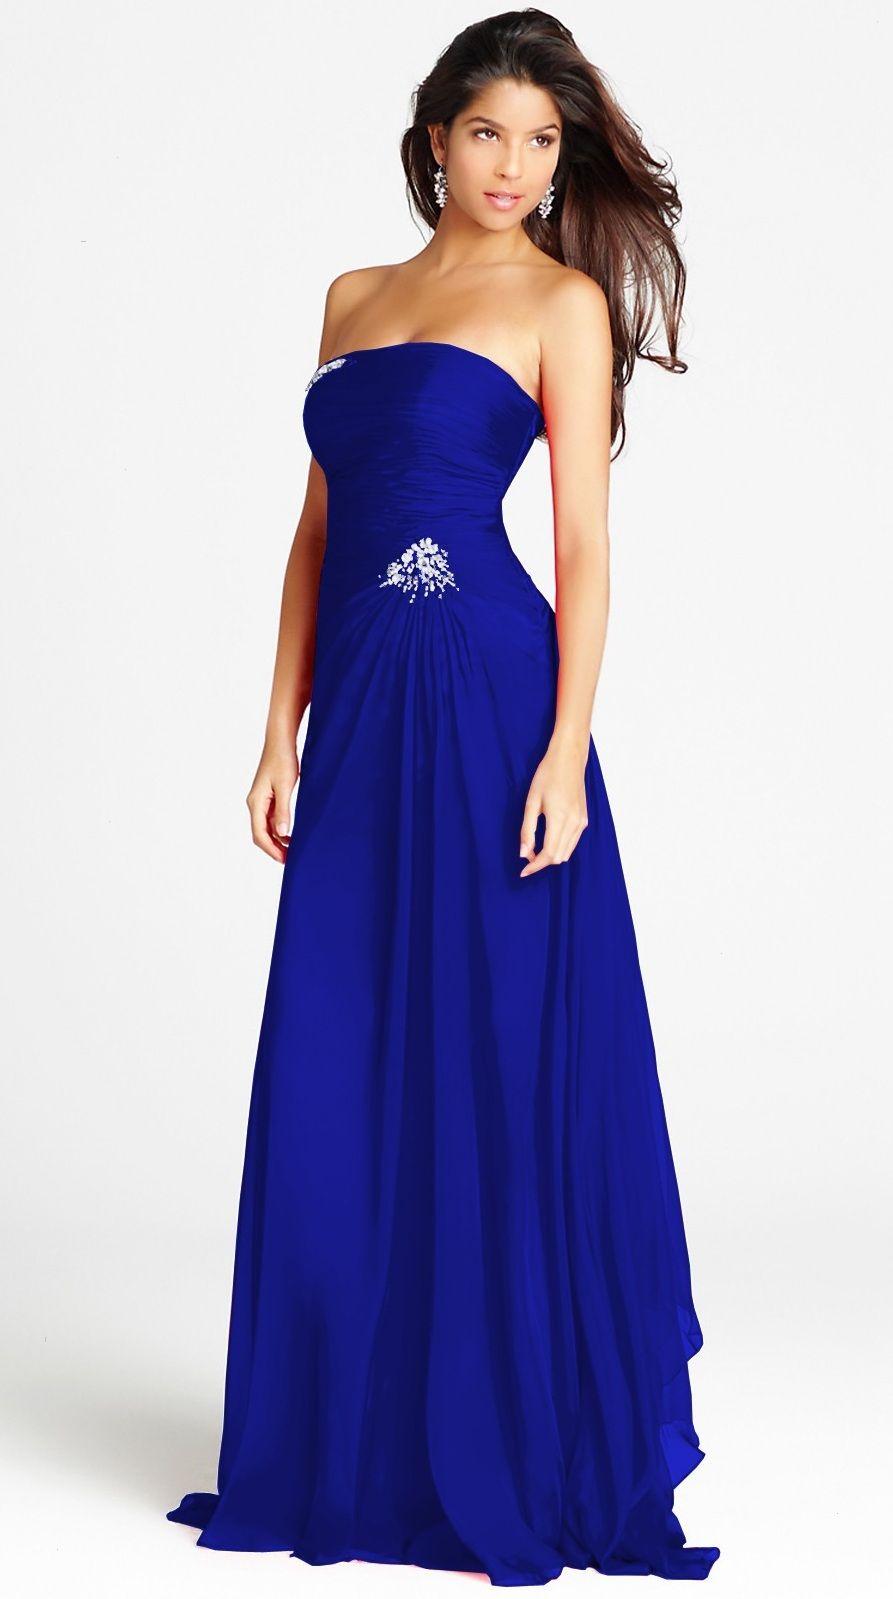 Royal blue prom dress royalbluepromdressdesign like a